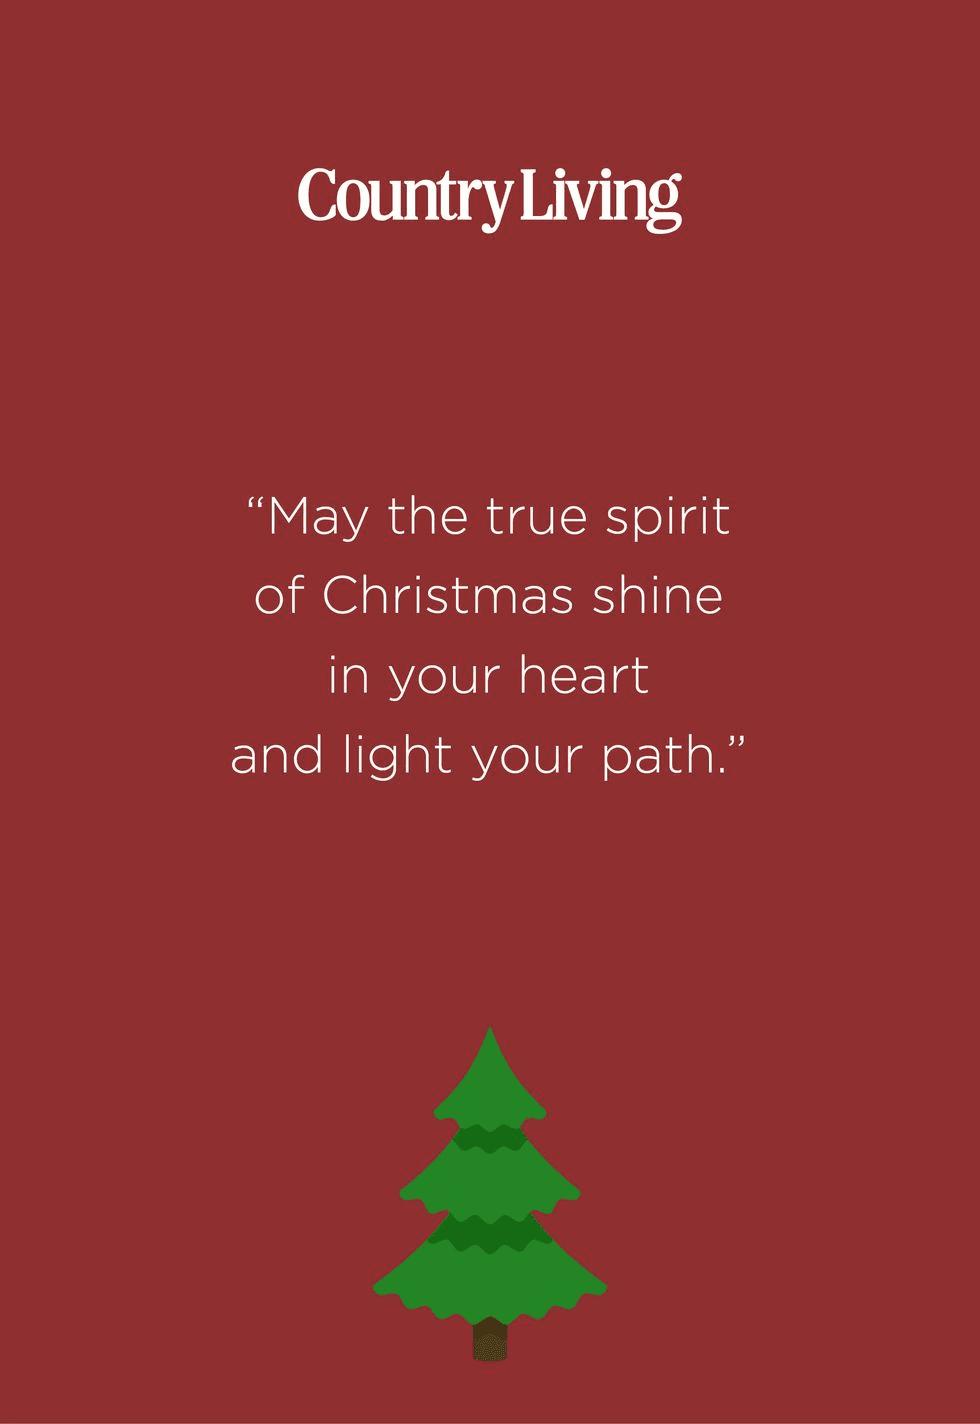 Mery Christmas Wishes 3